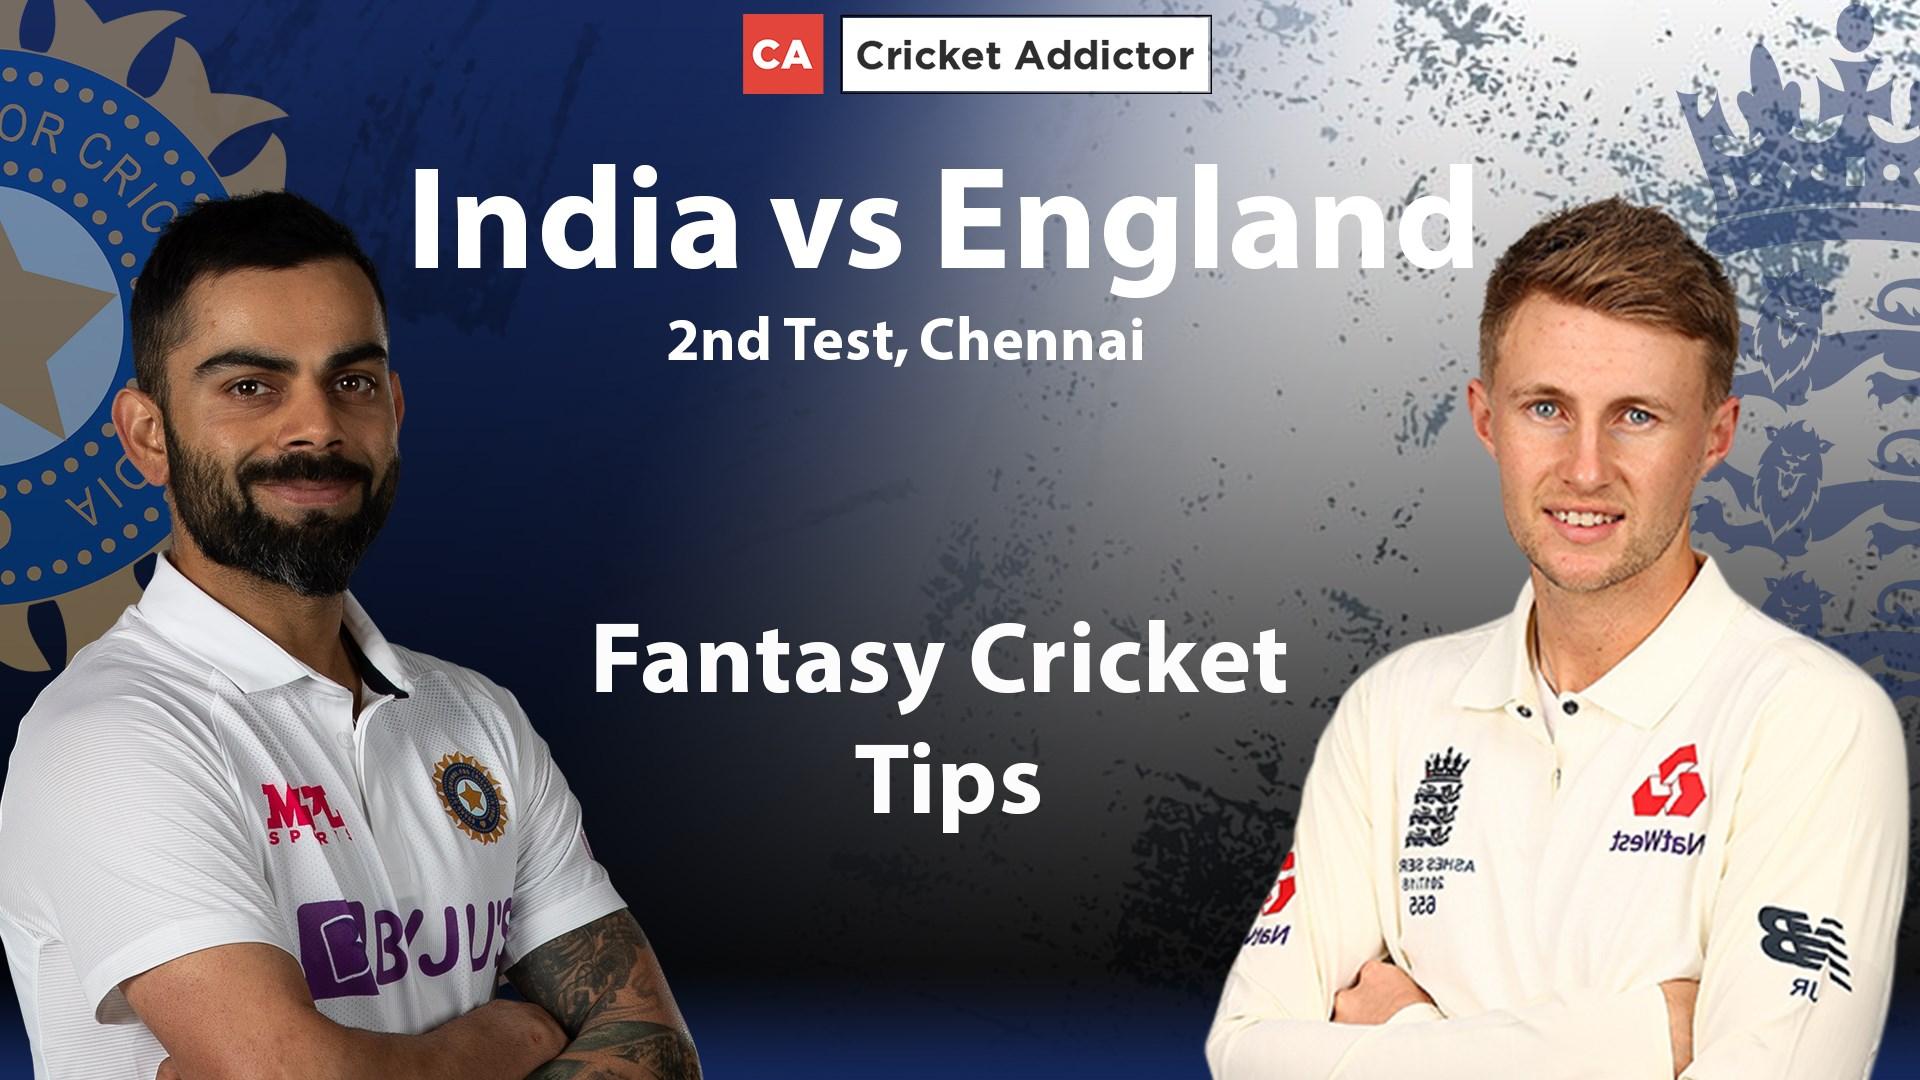 India vs England 2nd Test Dream11 Prediction Fantasy Cricket Tips Dream11 Team